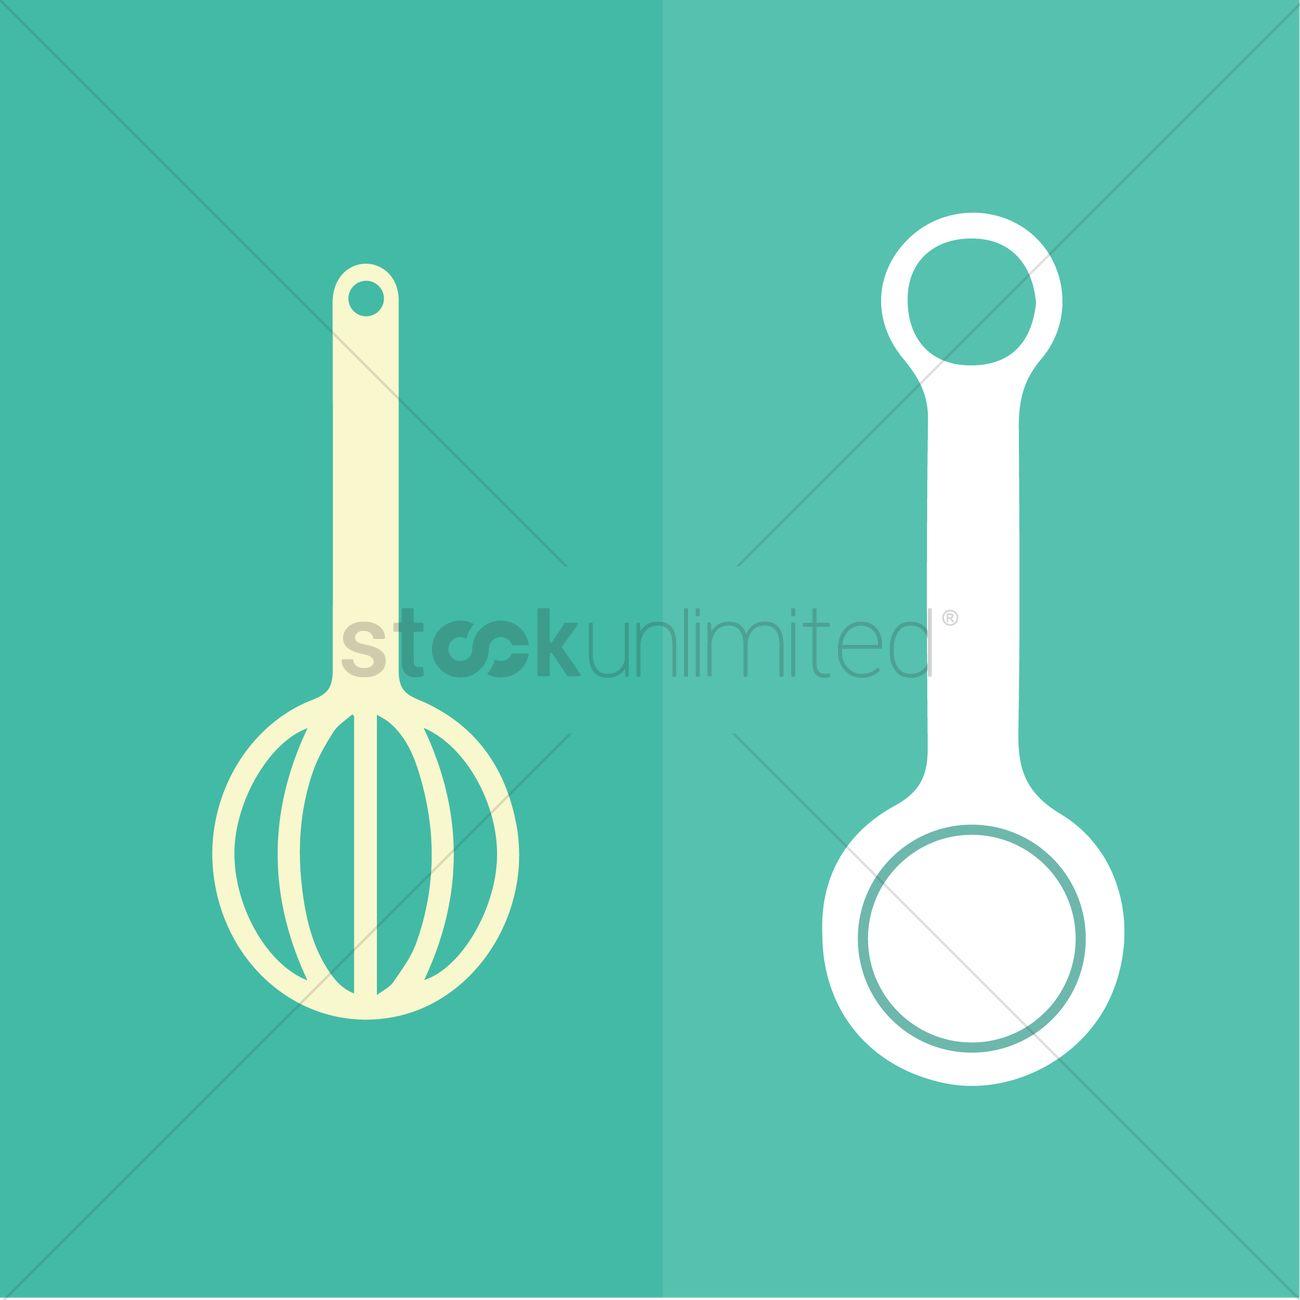 Baking utensils Vector Image - 1471710   StockUnlimited